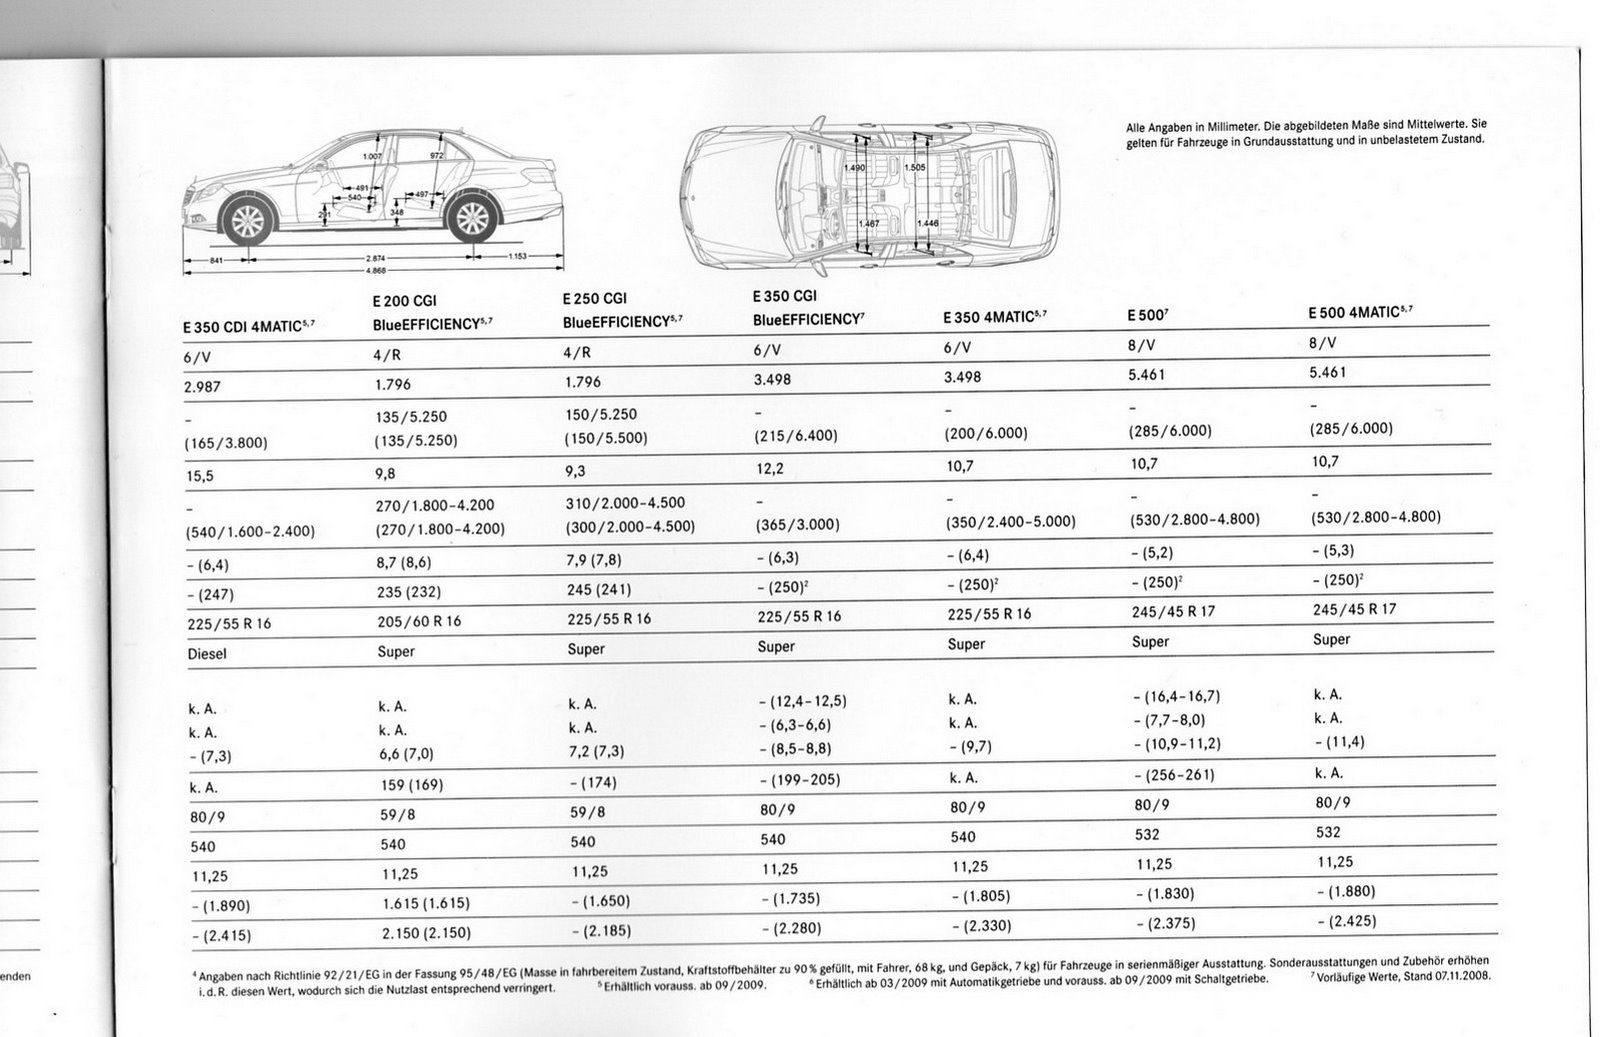 2010 Mercedes E Class Sedan Official Brochure Scans Leaked